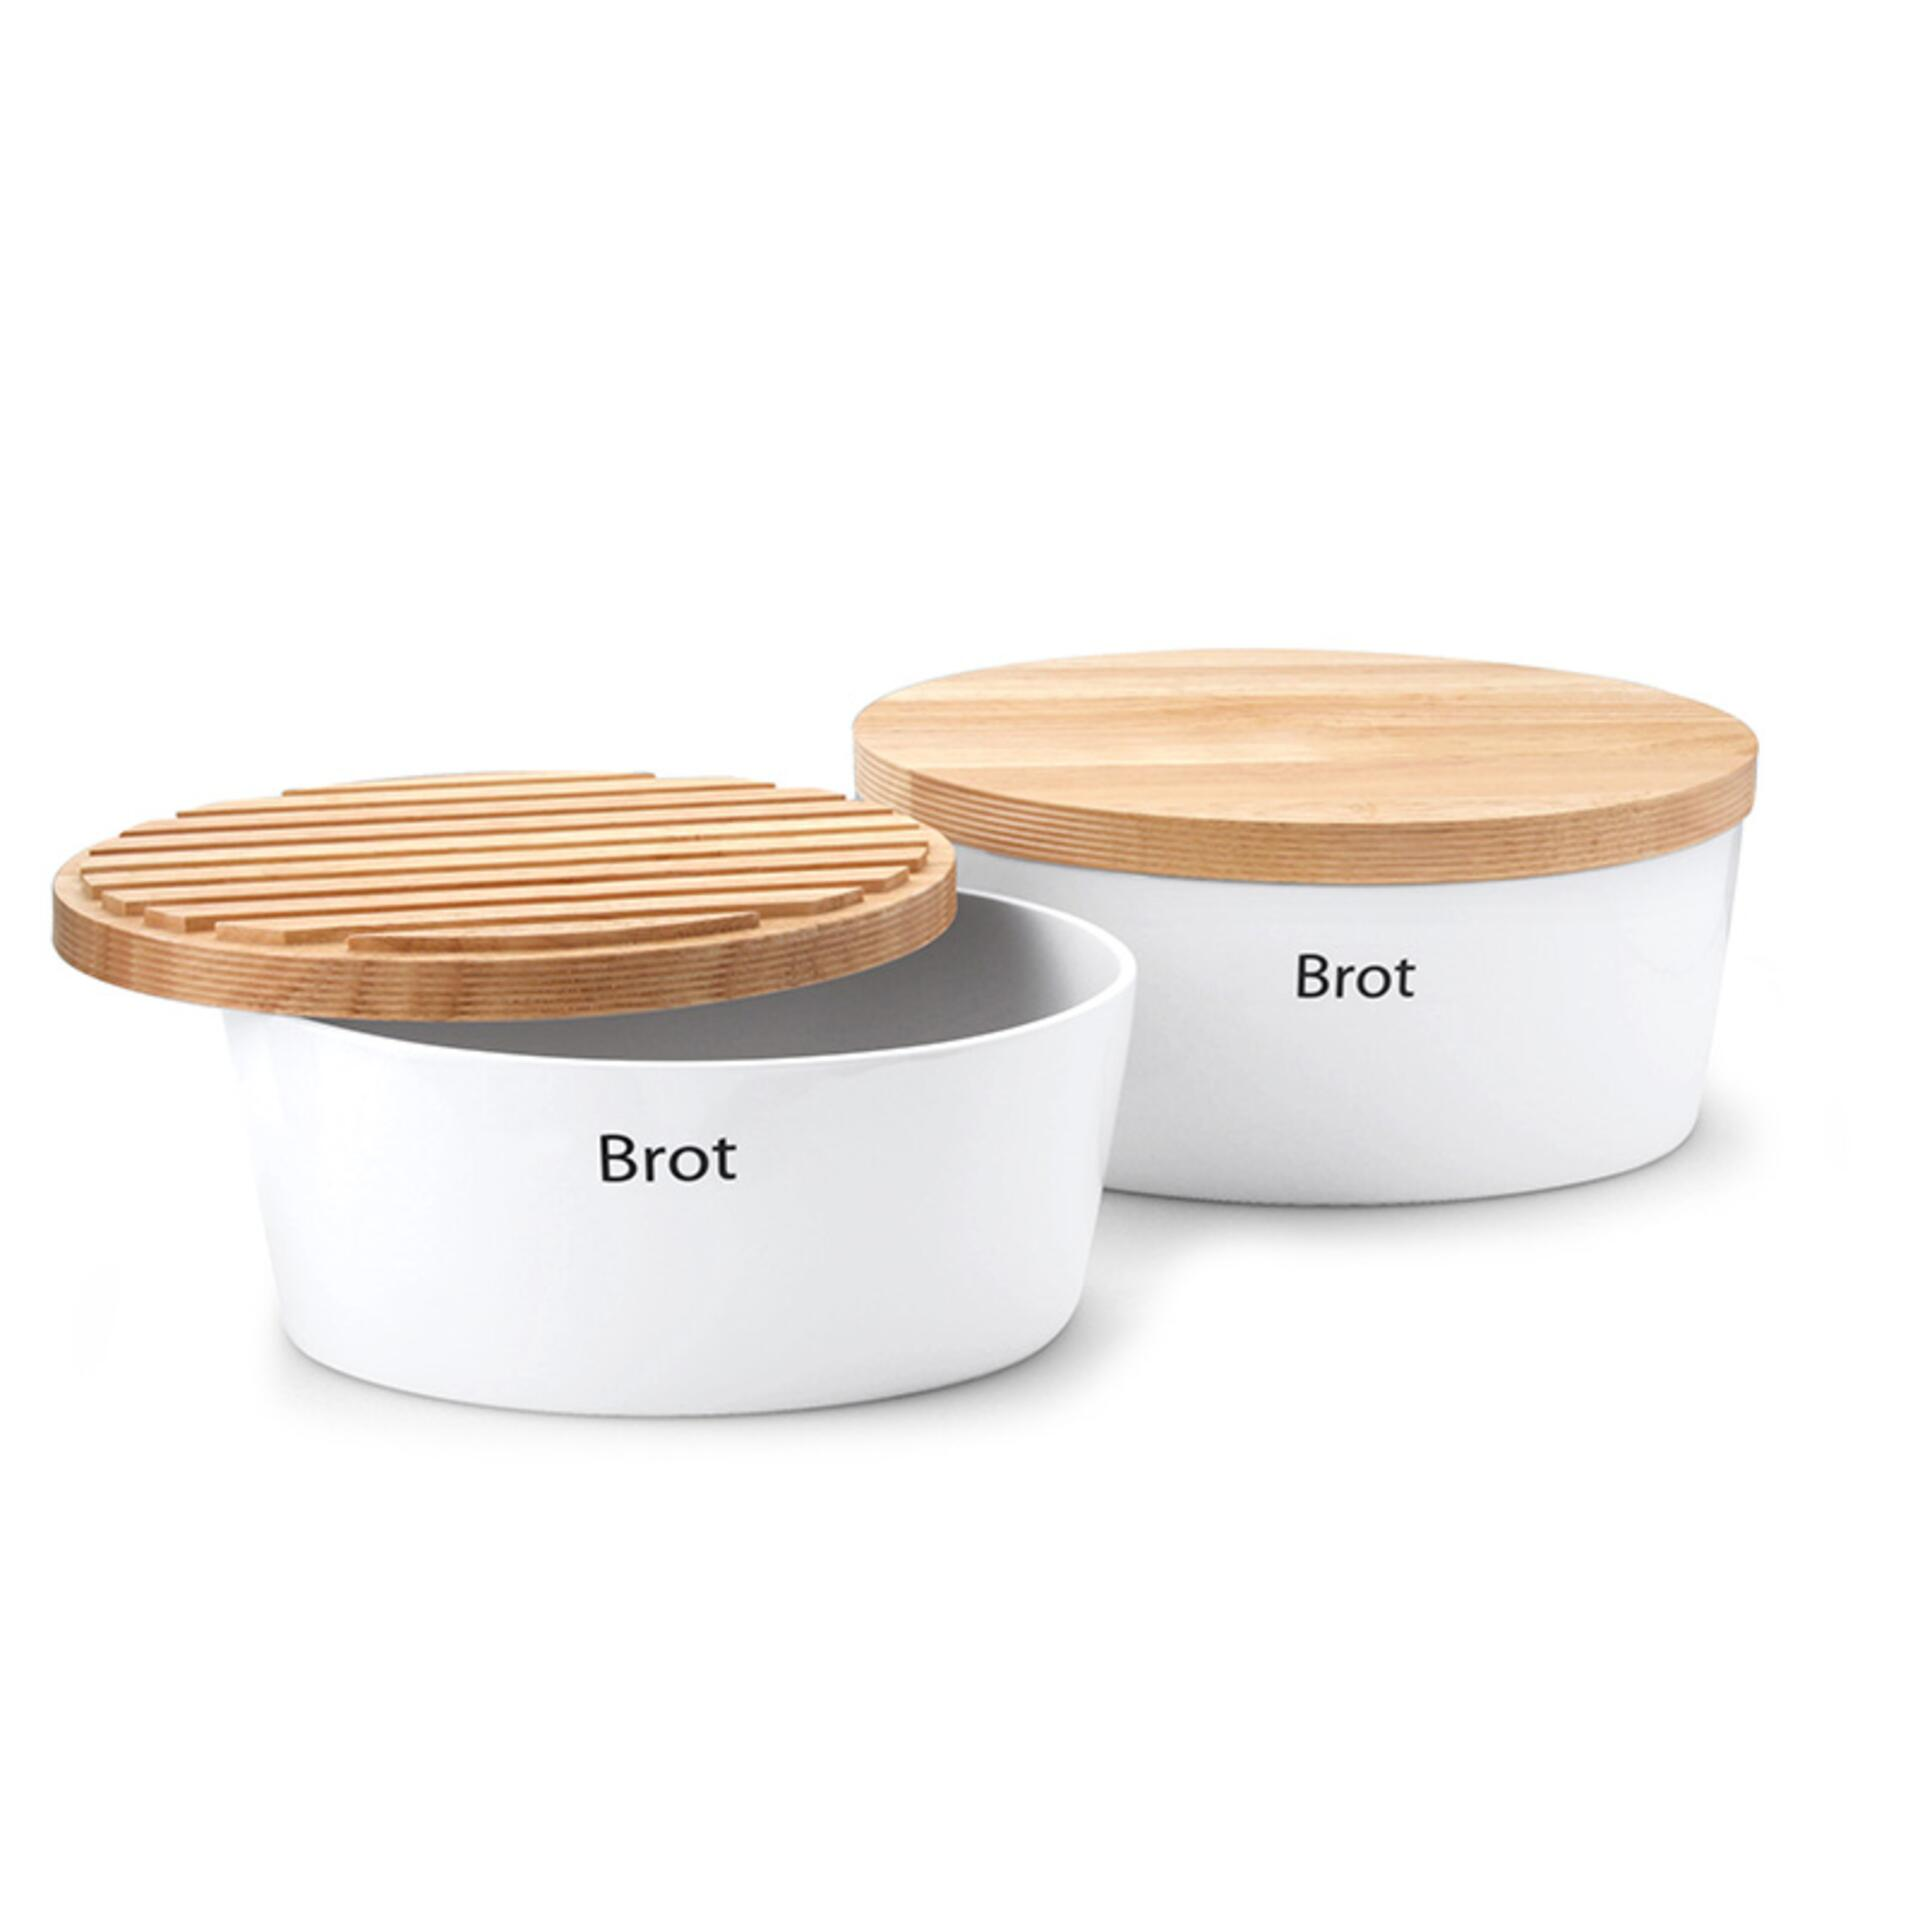 Continenta Brottopf oval mit Holzdeckel 27 x 20 x 13,5 cm